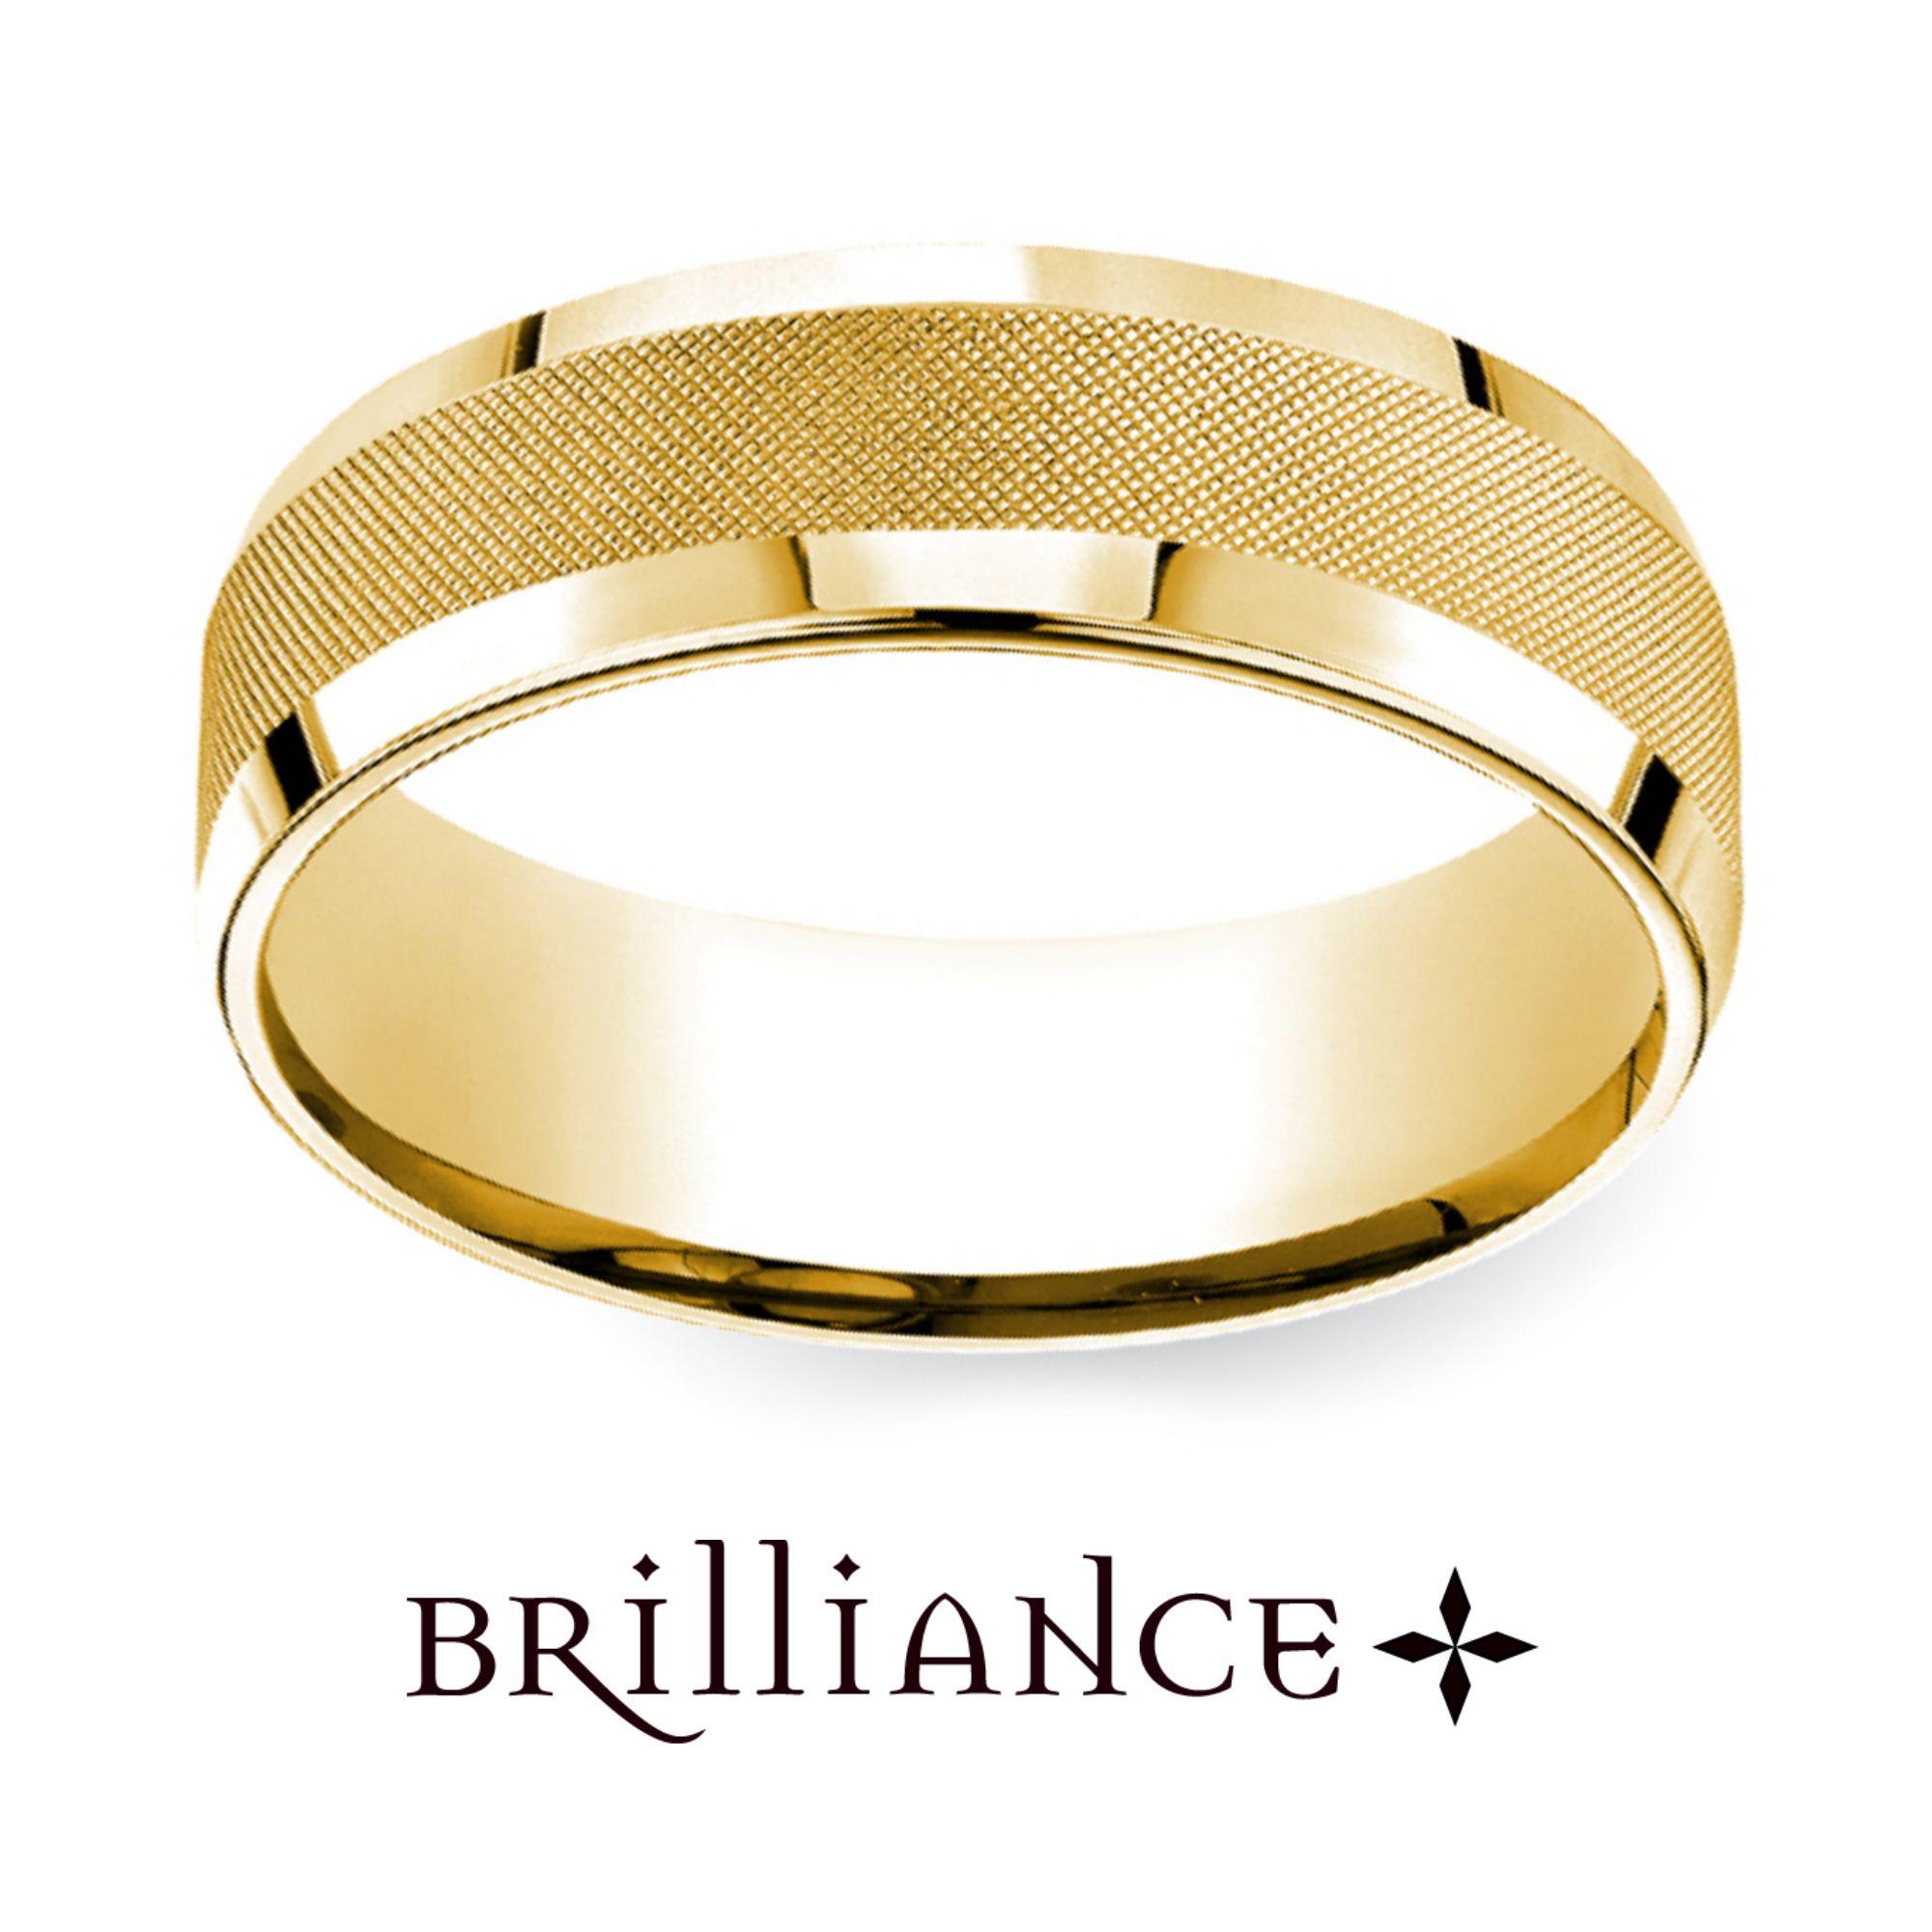 Cross Hatch Men s Wedding Ring in Yellow Gold